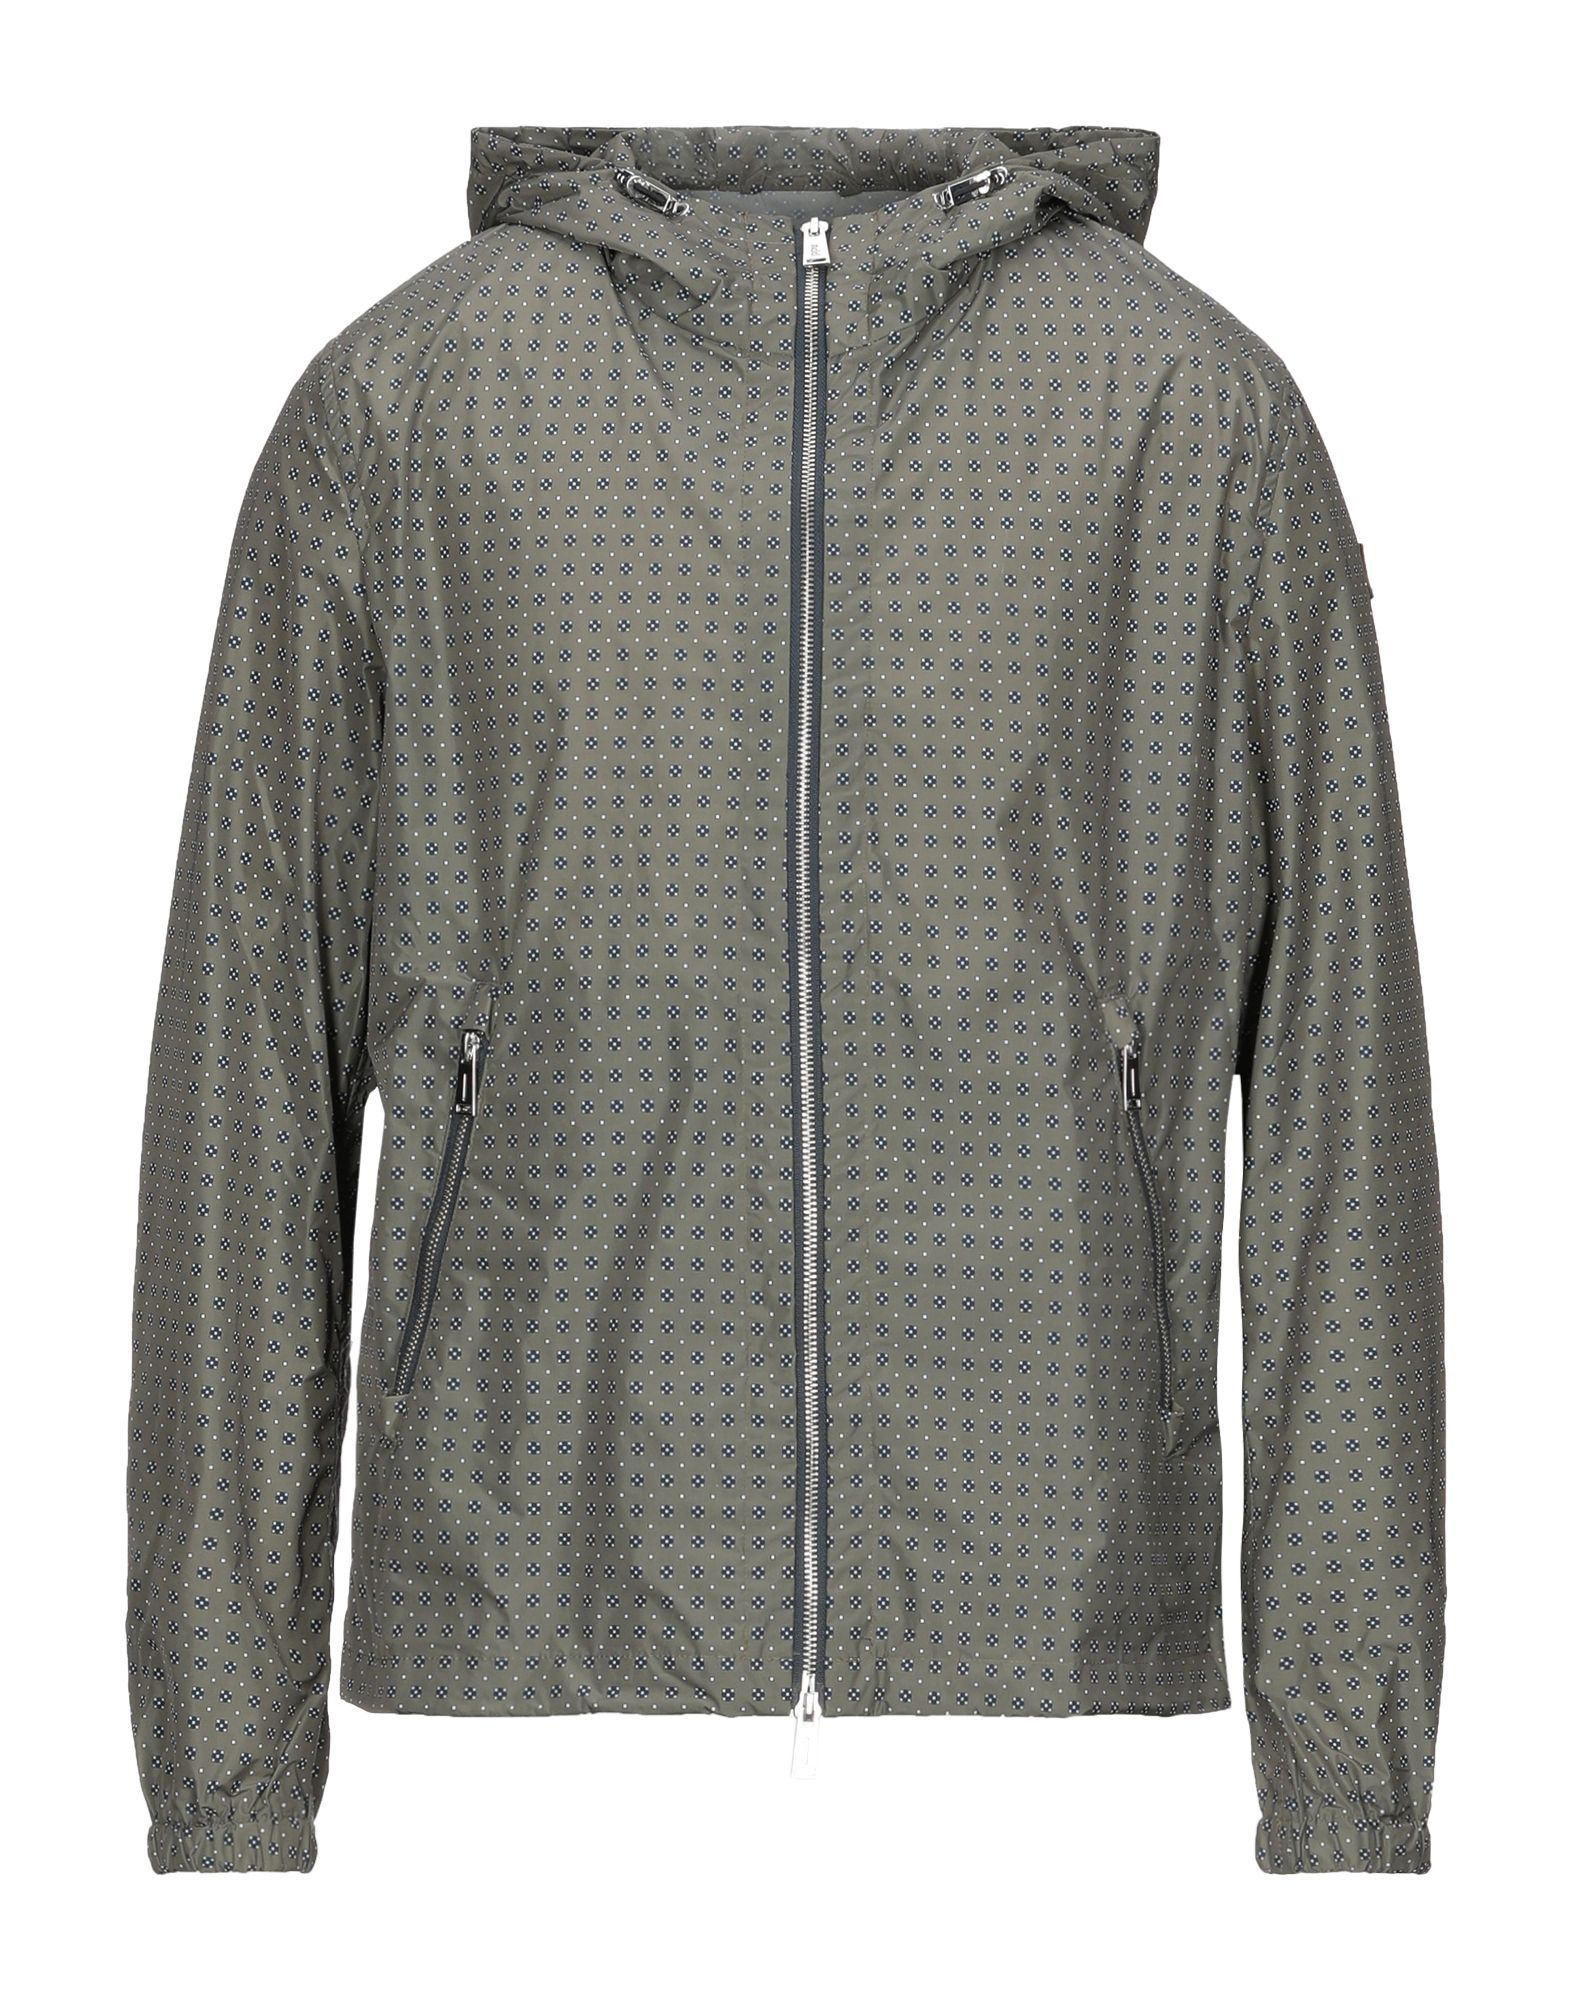 Add Military Green Techno Fabric Jacket